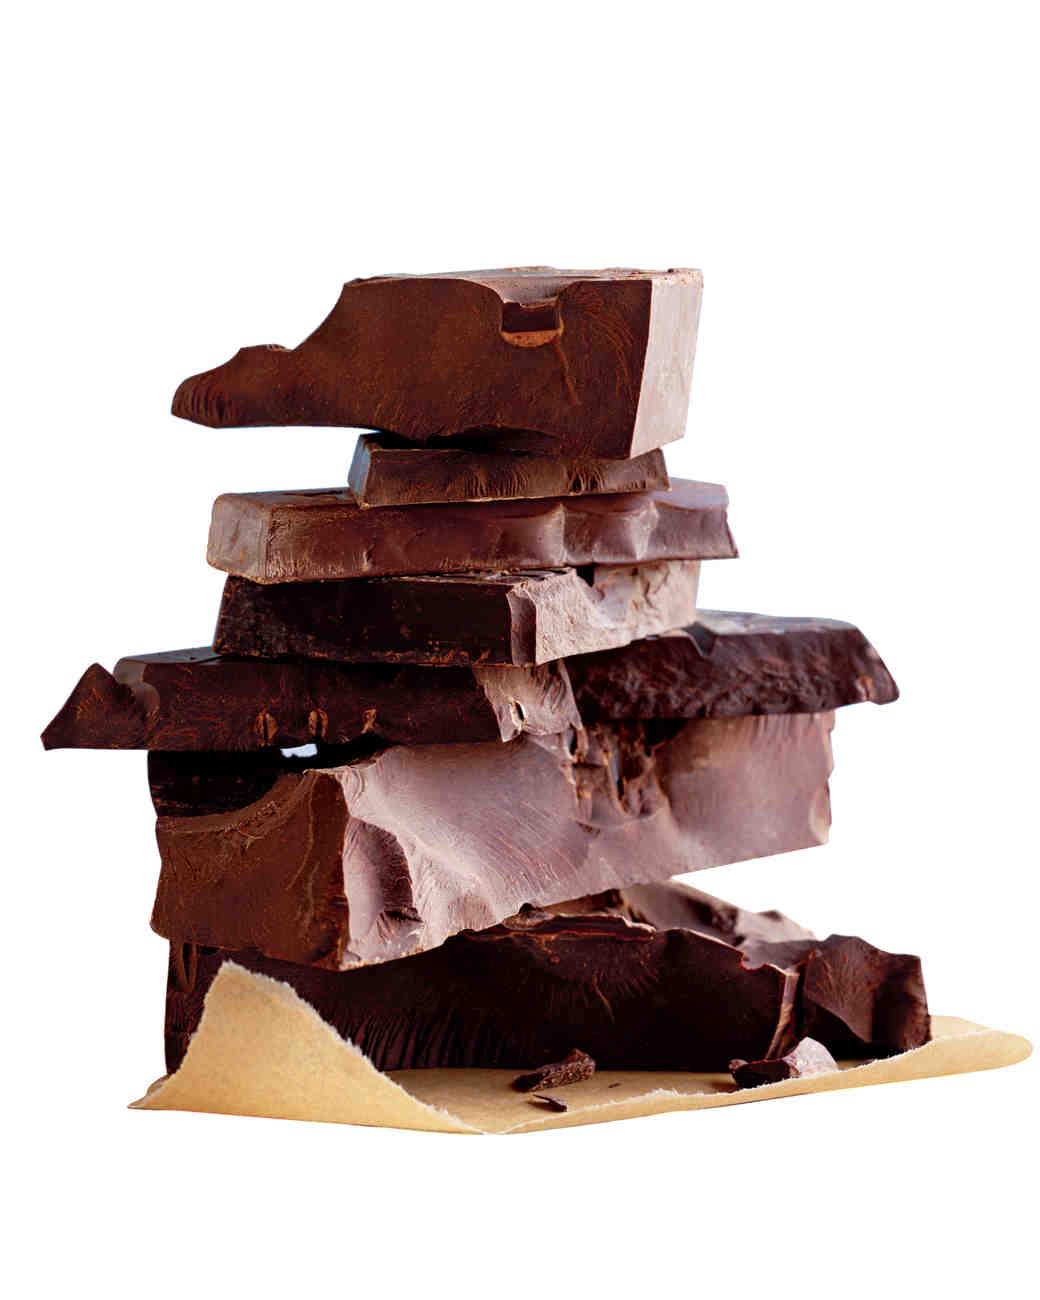 dark-chcolate-mbd0112.jpg